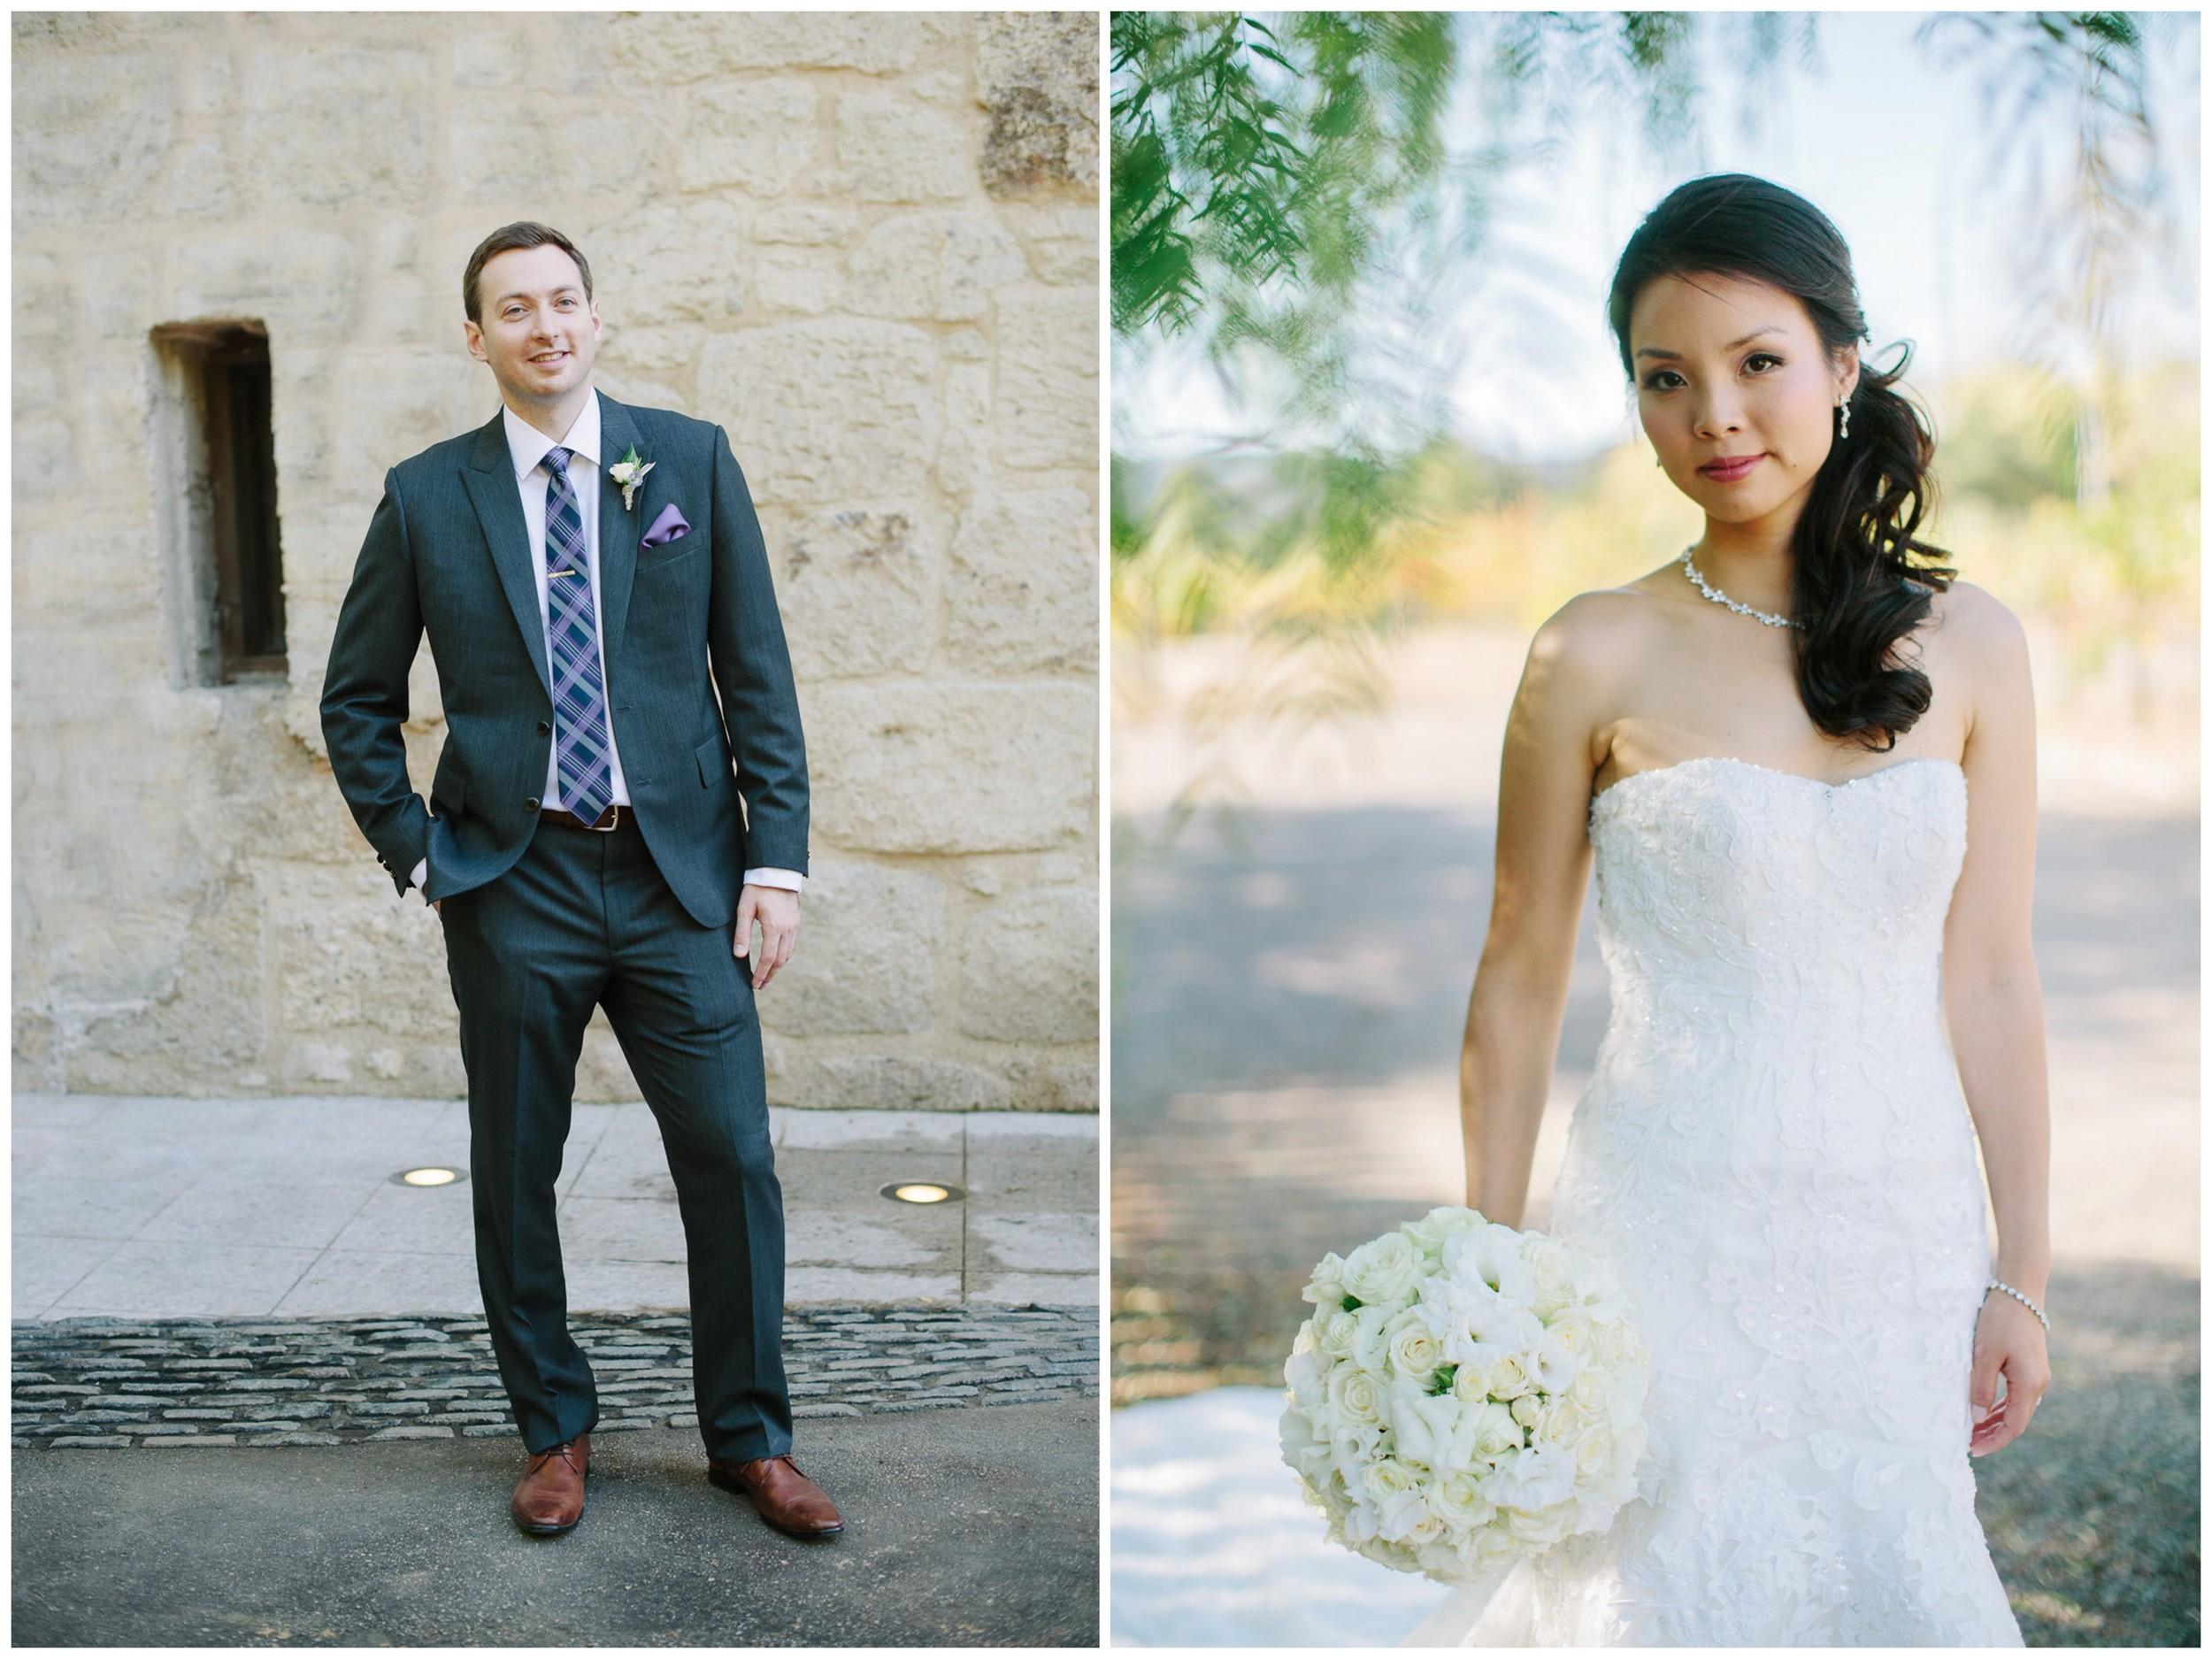 Jenny & Adam3.jpg